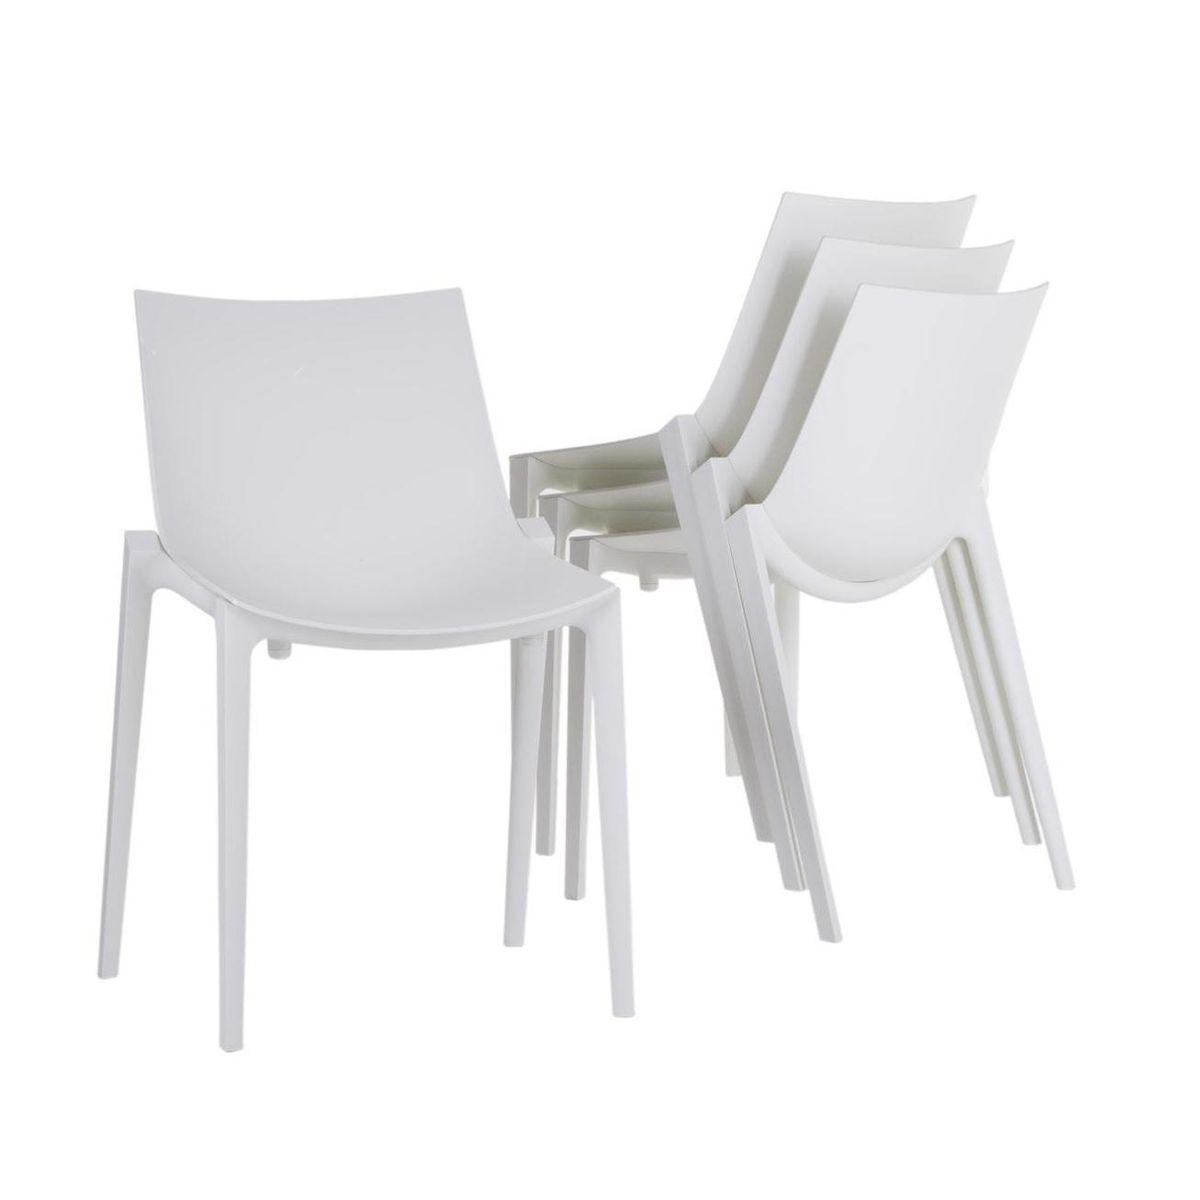 Basic chair design - Magis Zartan Basic Chair 4 Piece Set With Seat Pads White 4